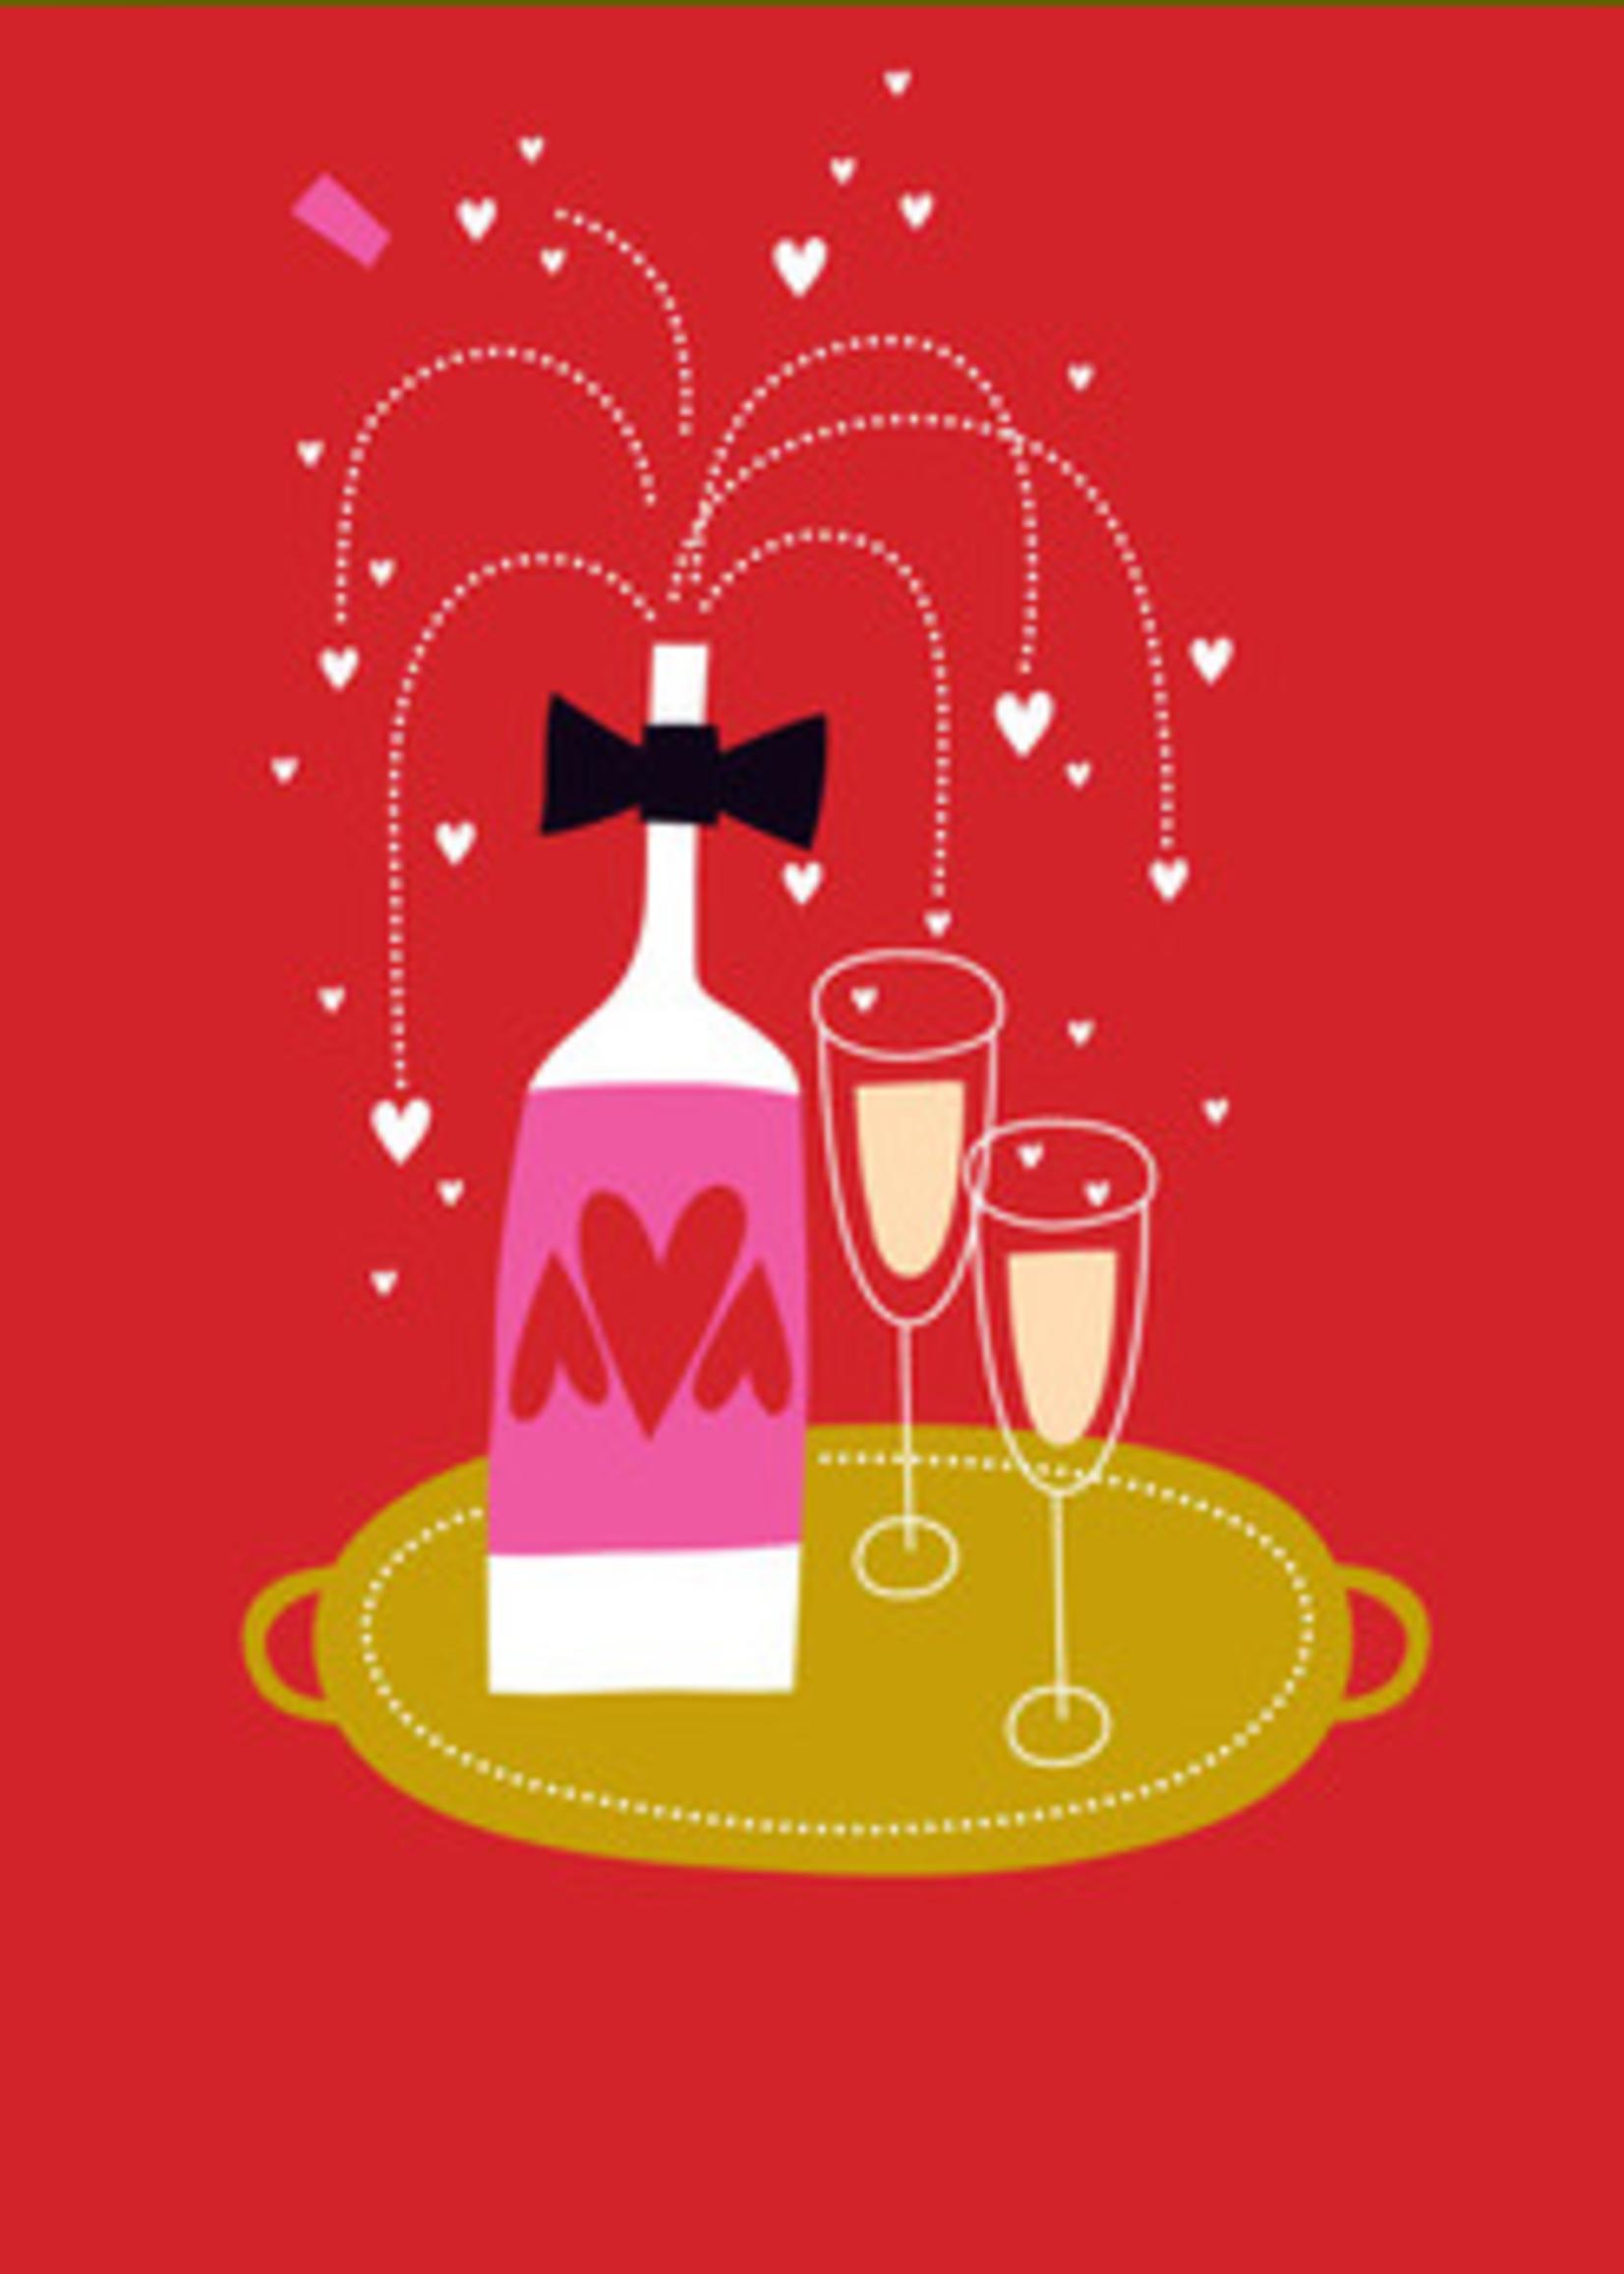 Card VDAY Champagne Bottle 2 Glasses